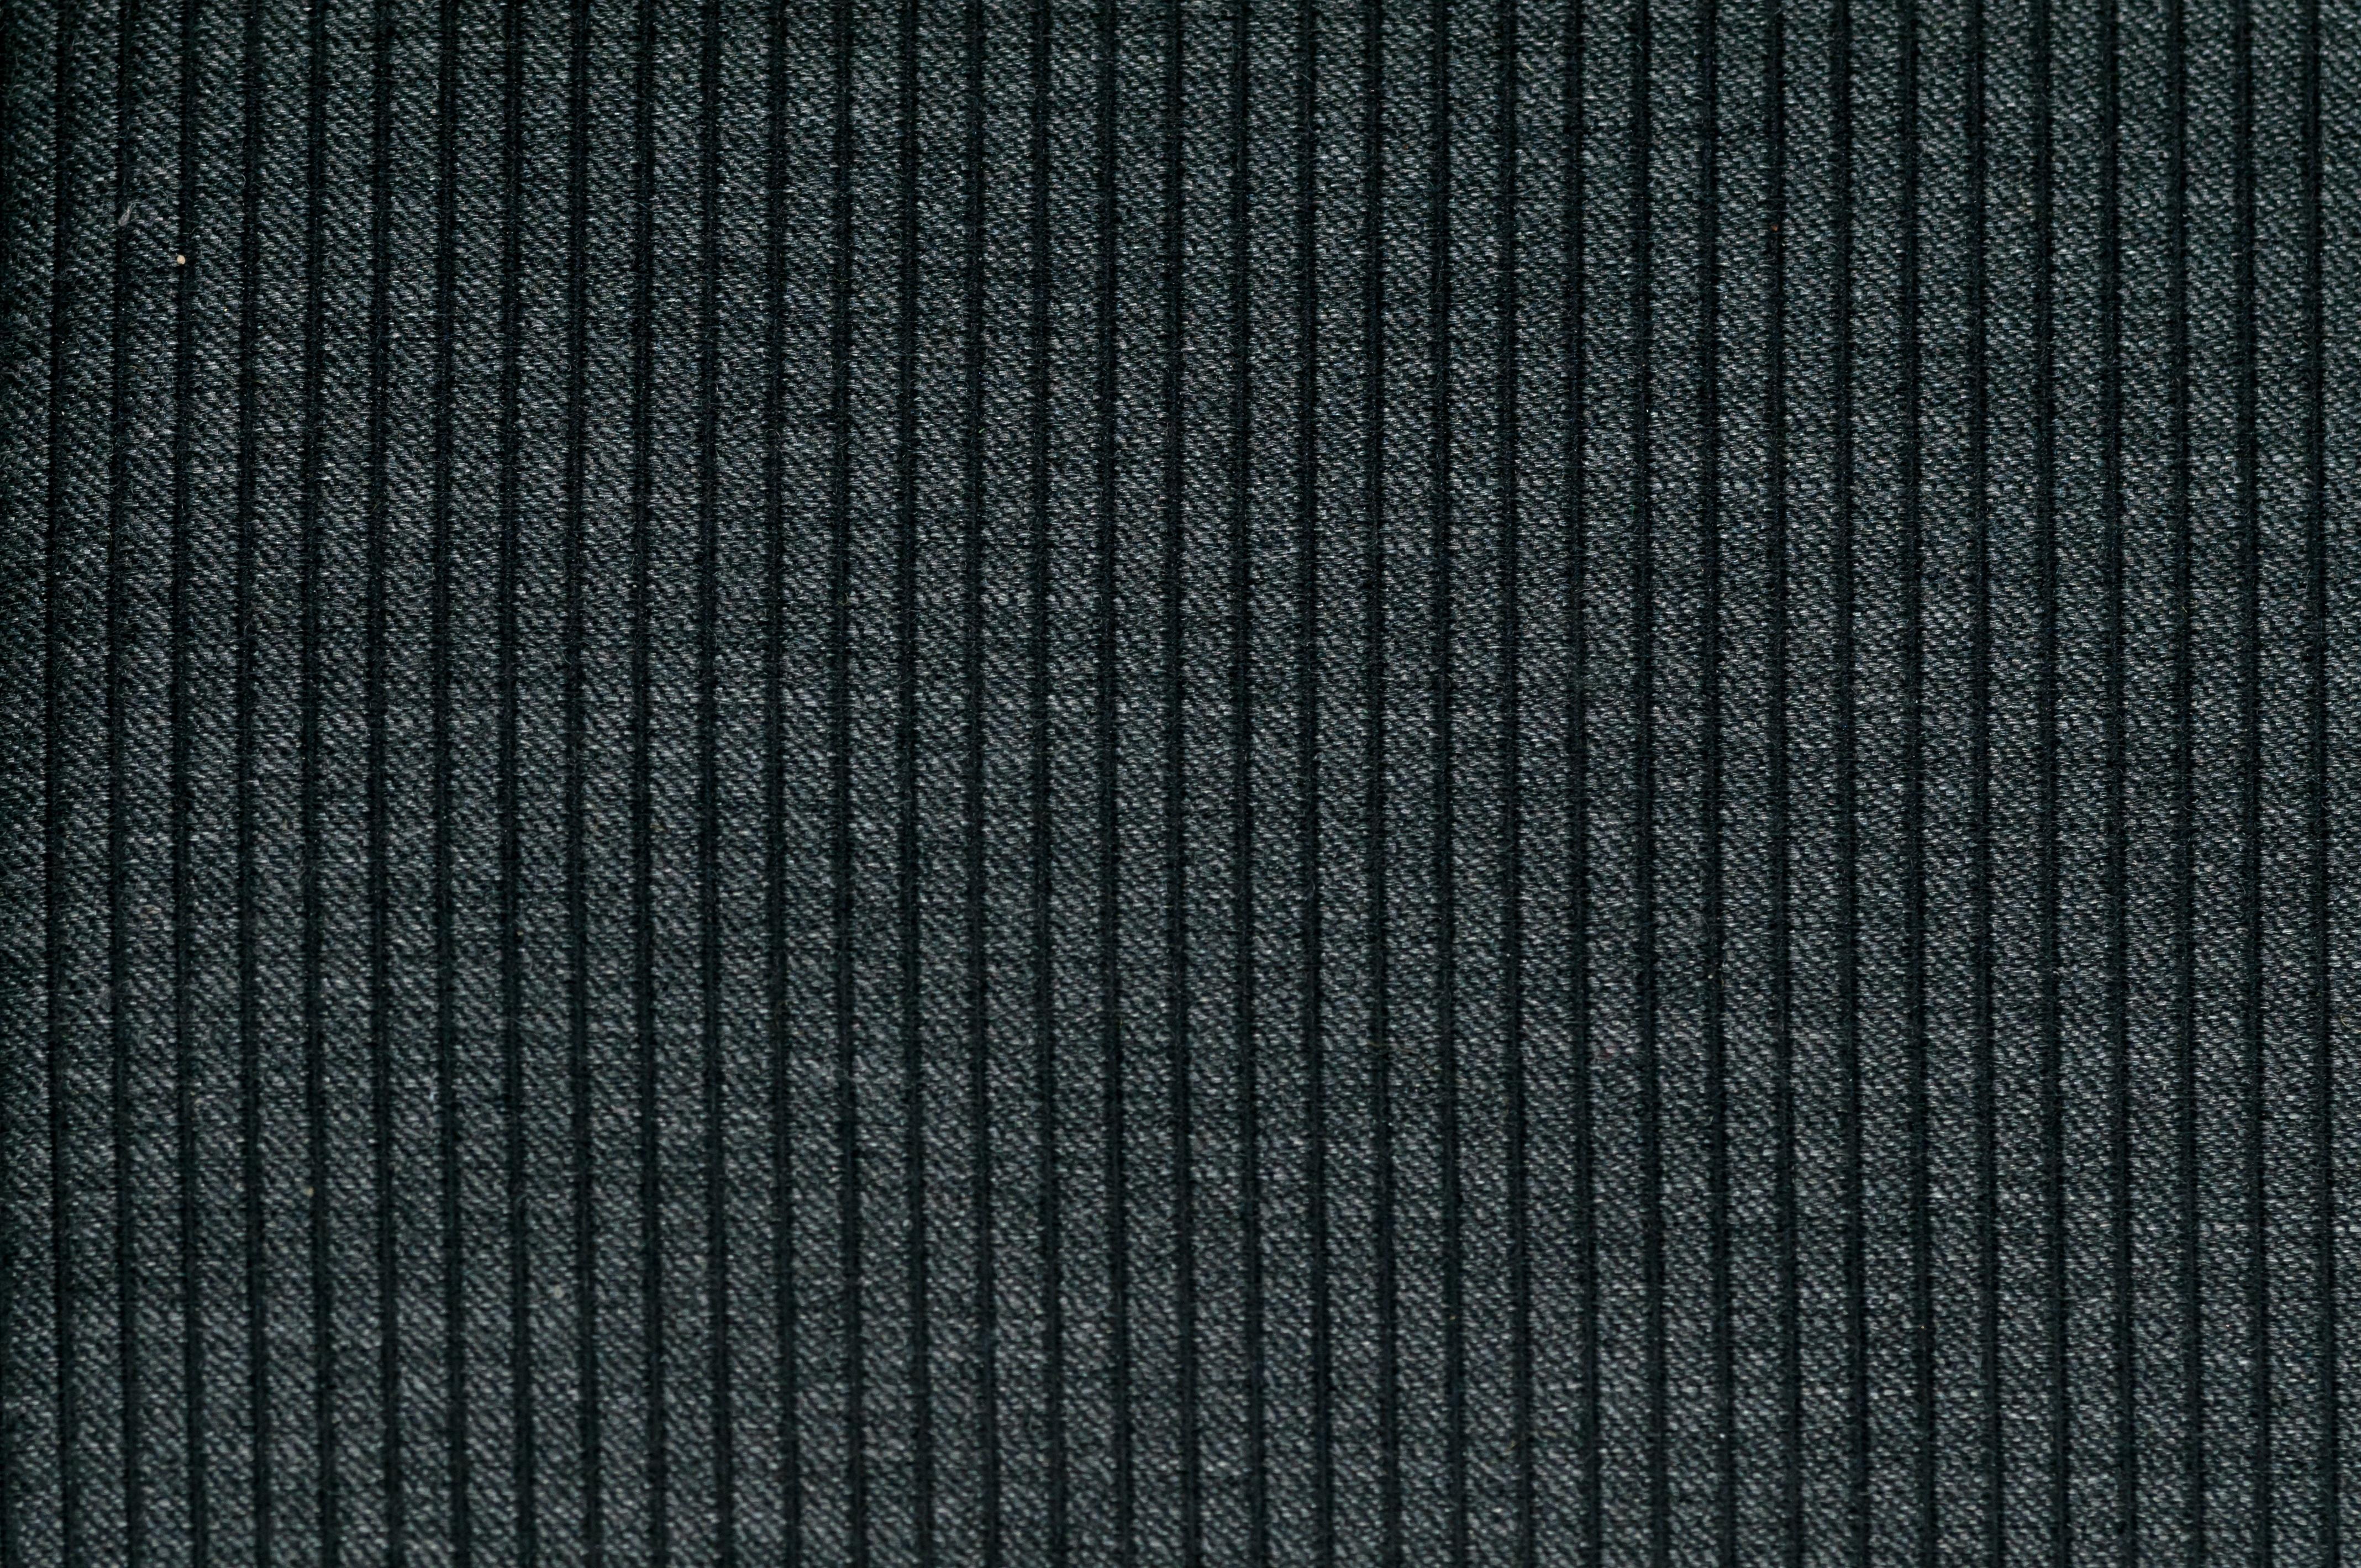 Line Texture Design : Free images retro texture floor decoration pattern